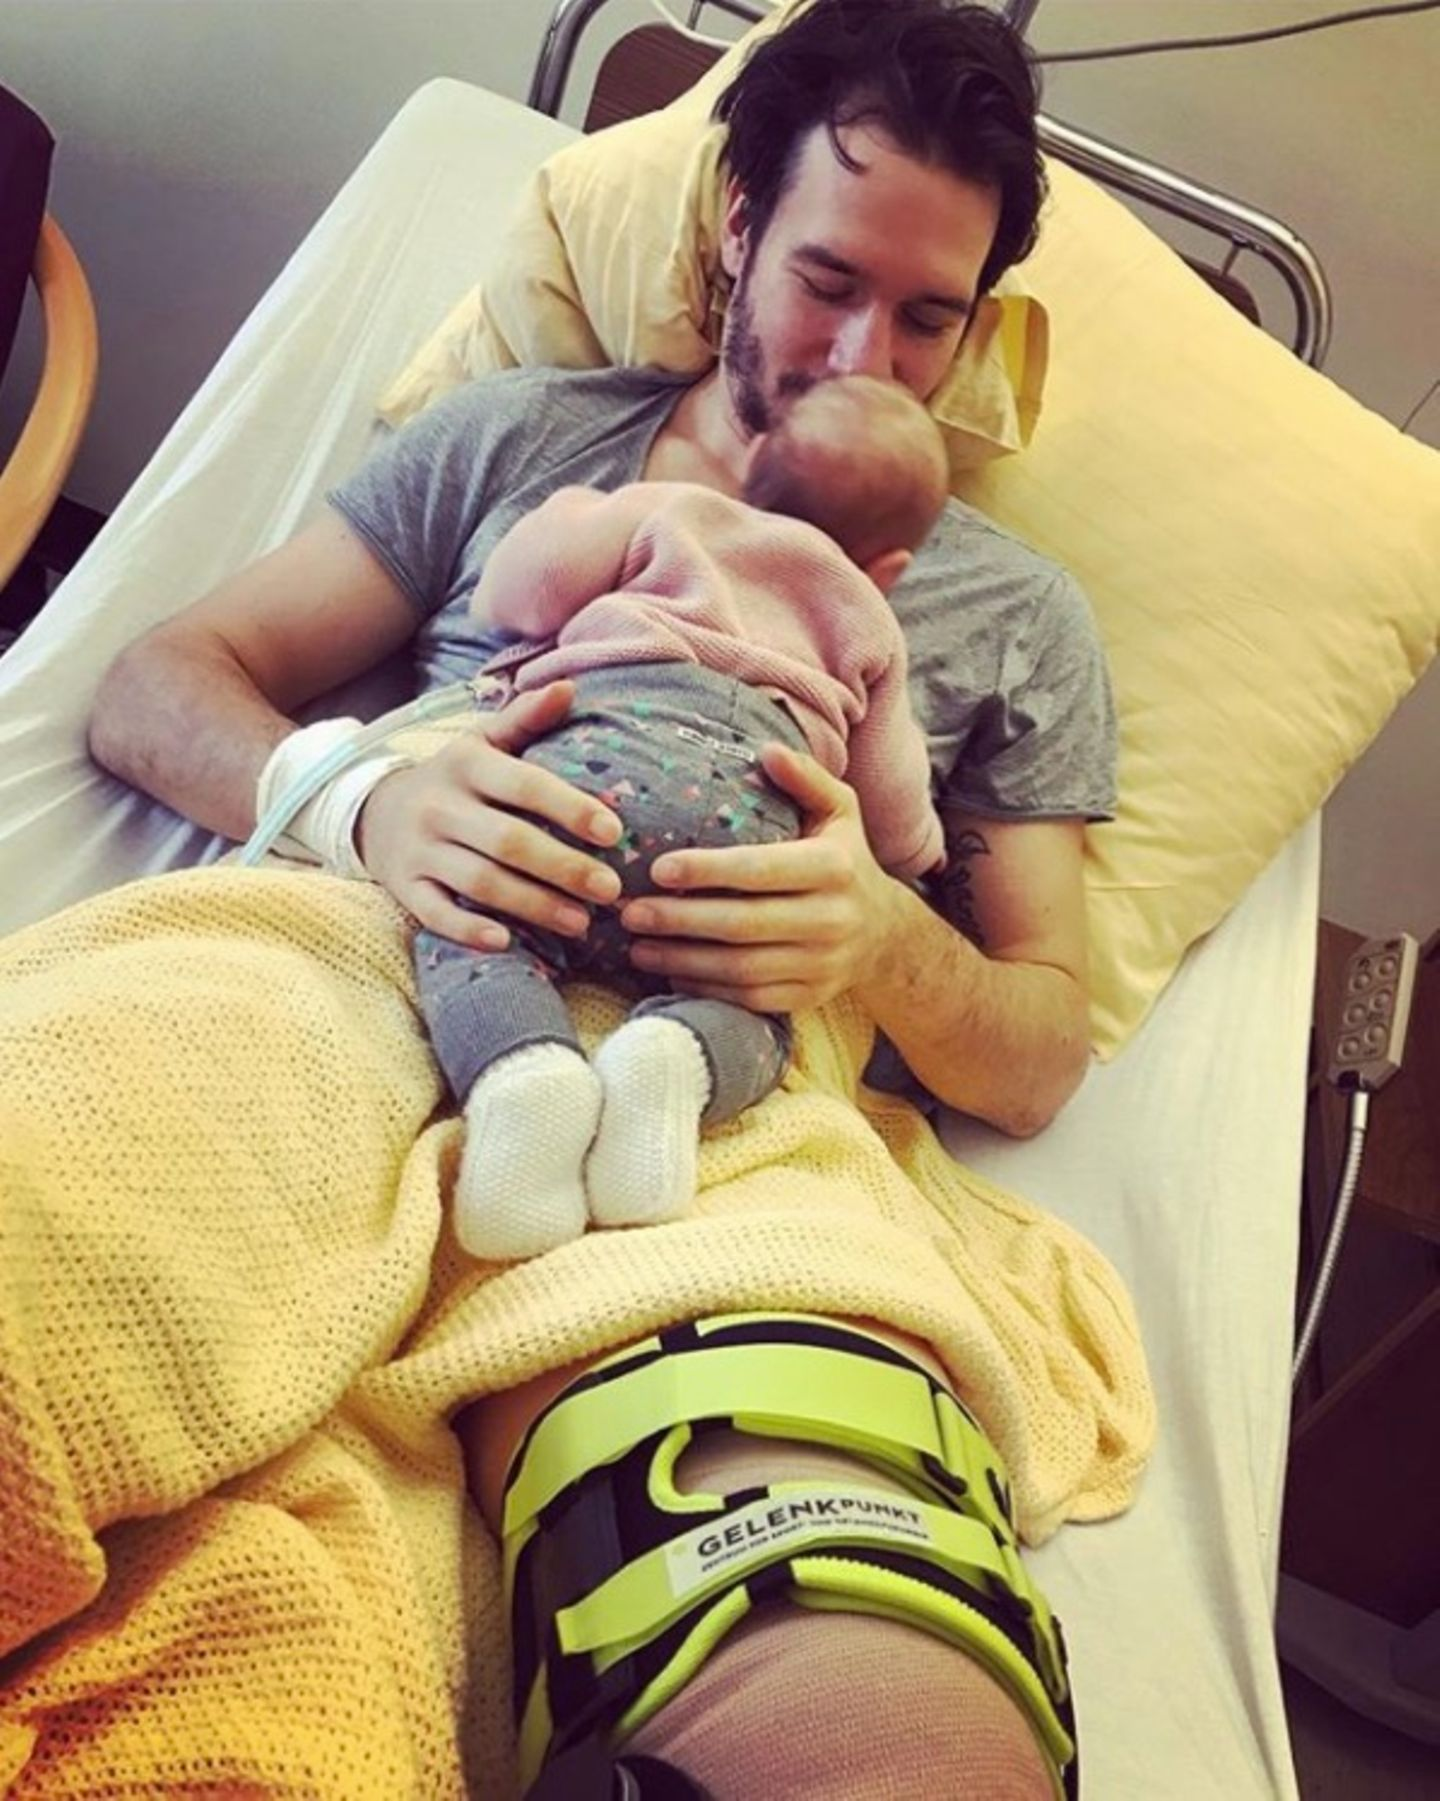 Skirennläufer Felix Neureuther muss wegen einer OP am Kreuzband ins Krankenbett. Töchterchen Matilda sorgt für den nötigen, süßen Trost.